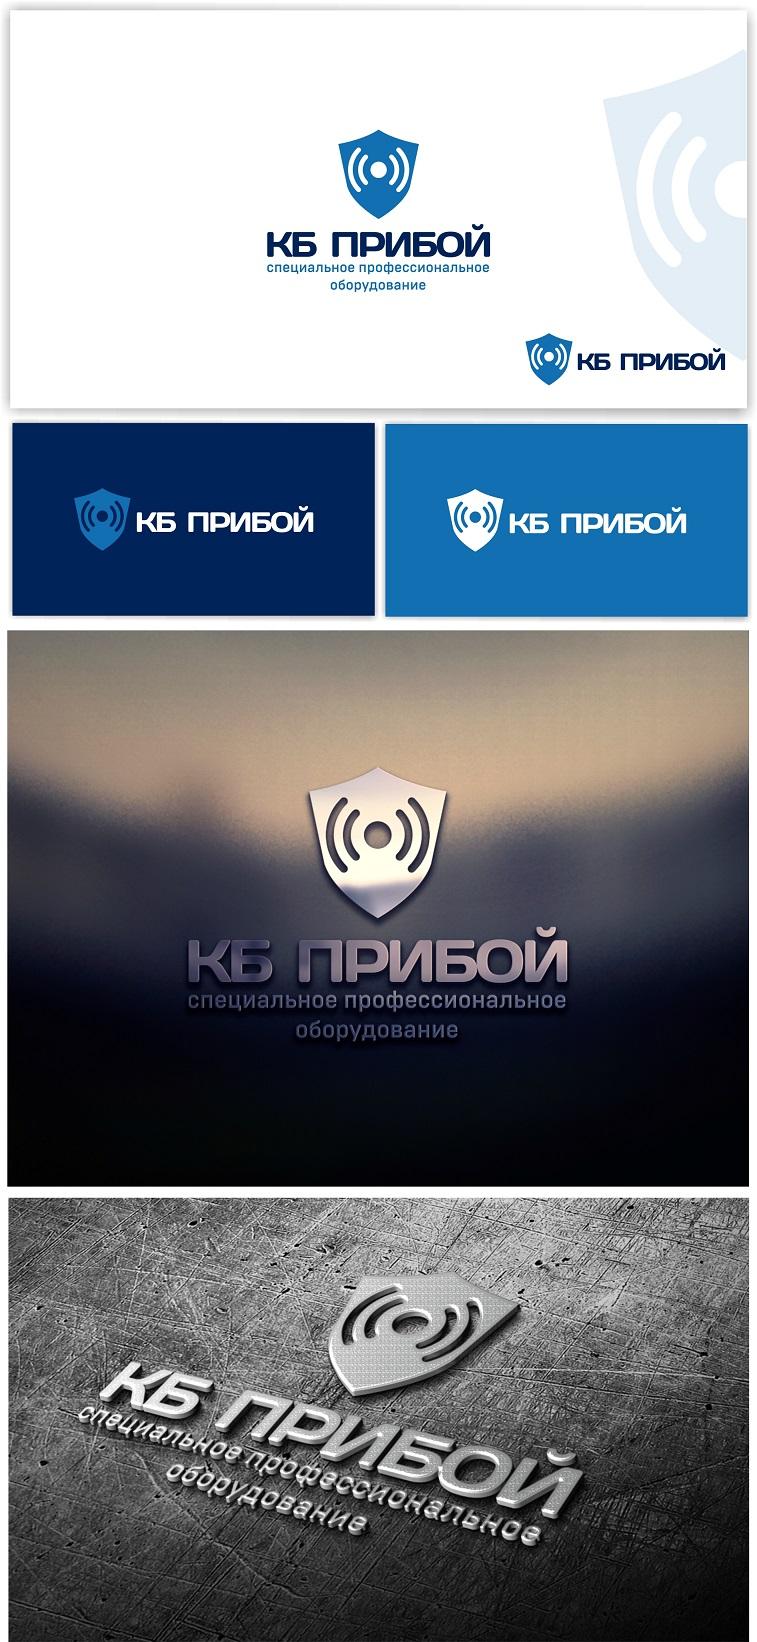 Разработка логотипа и фирменного стиля для КБ Прибой фото f_6005b2677499ba06.jpg